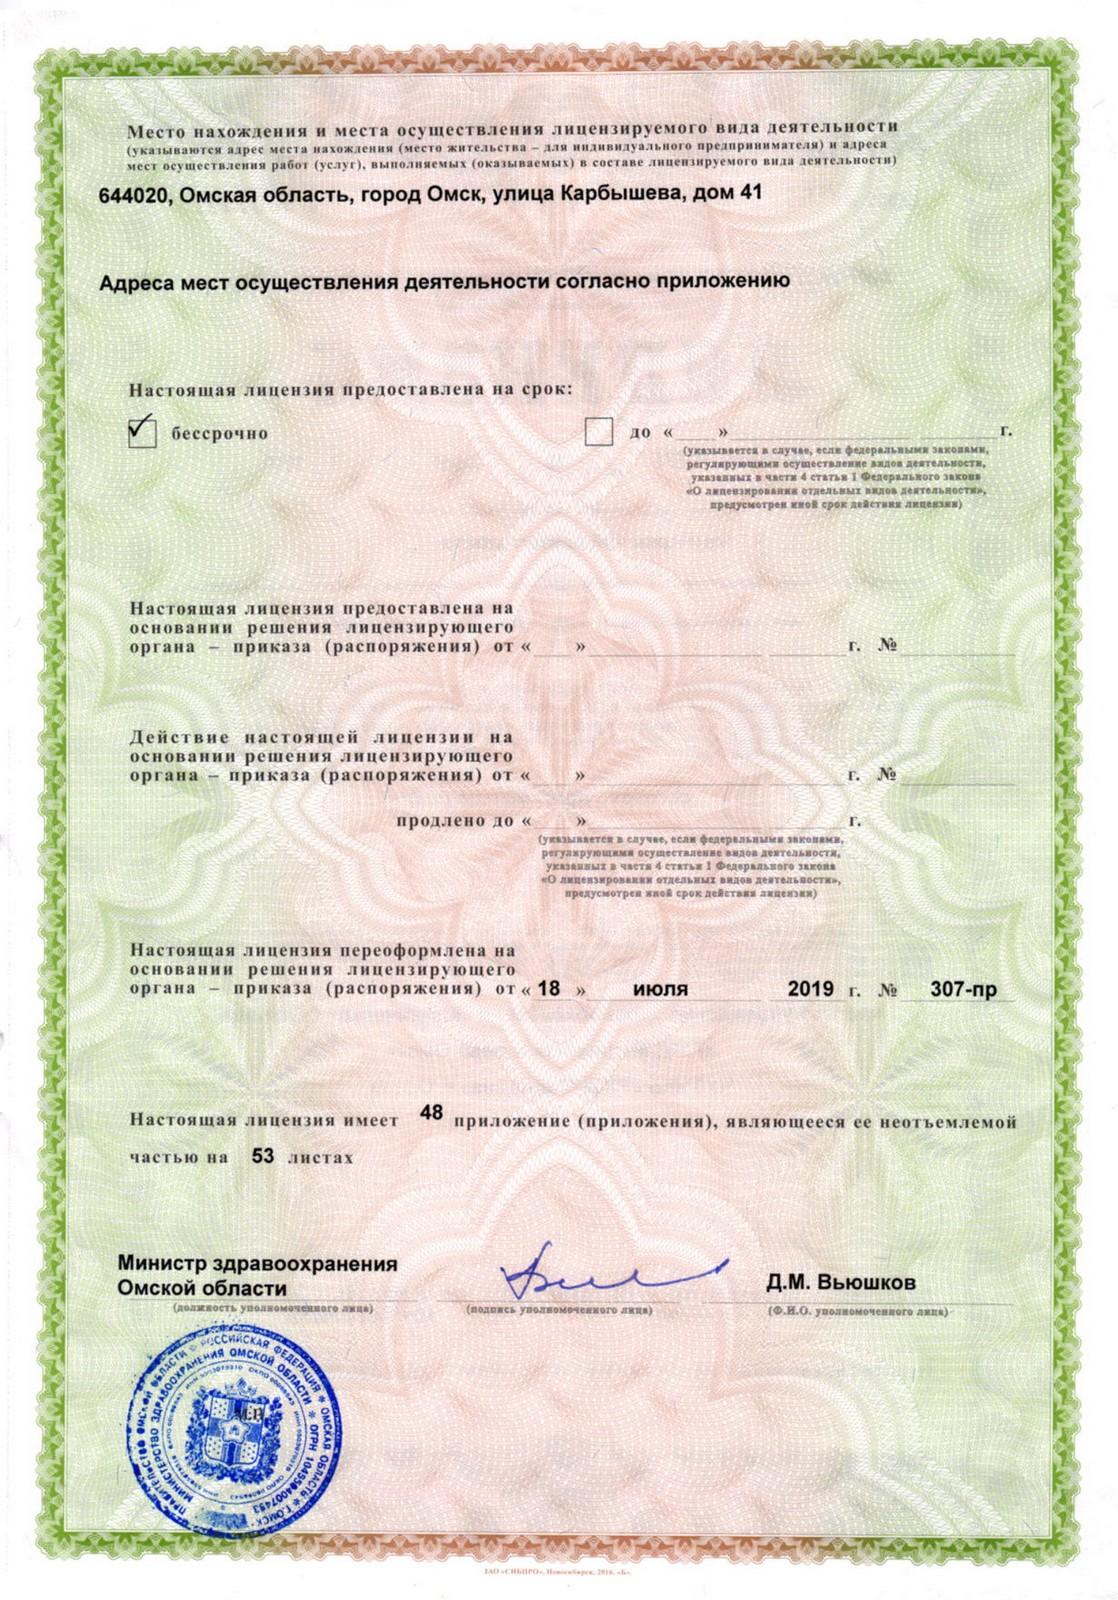 License-2019-07-18_02